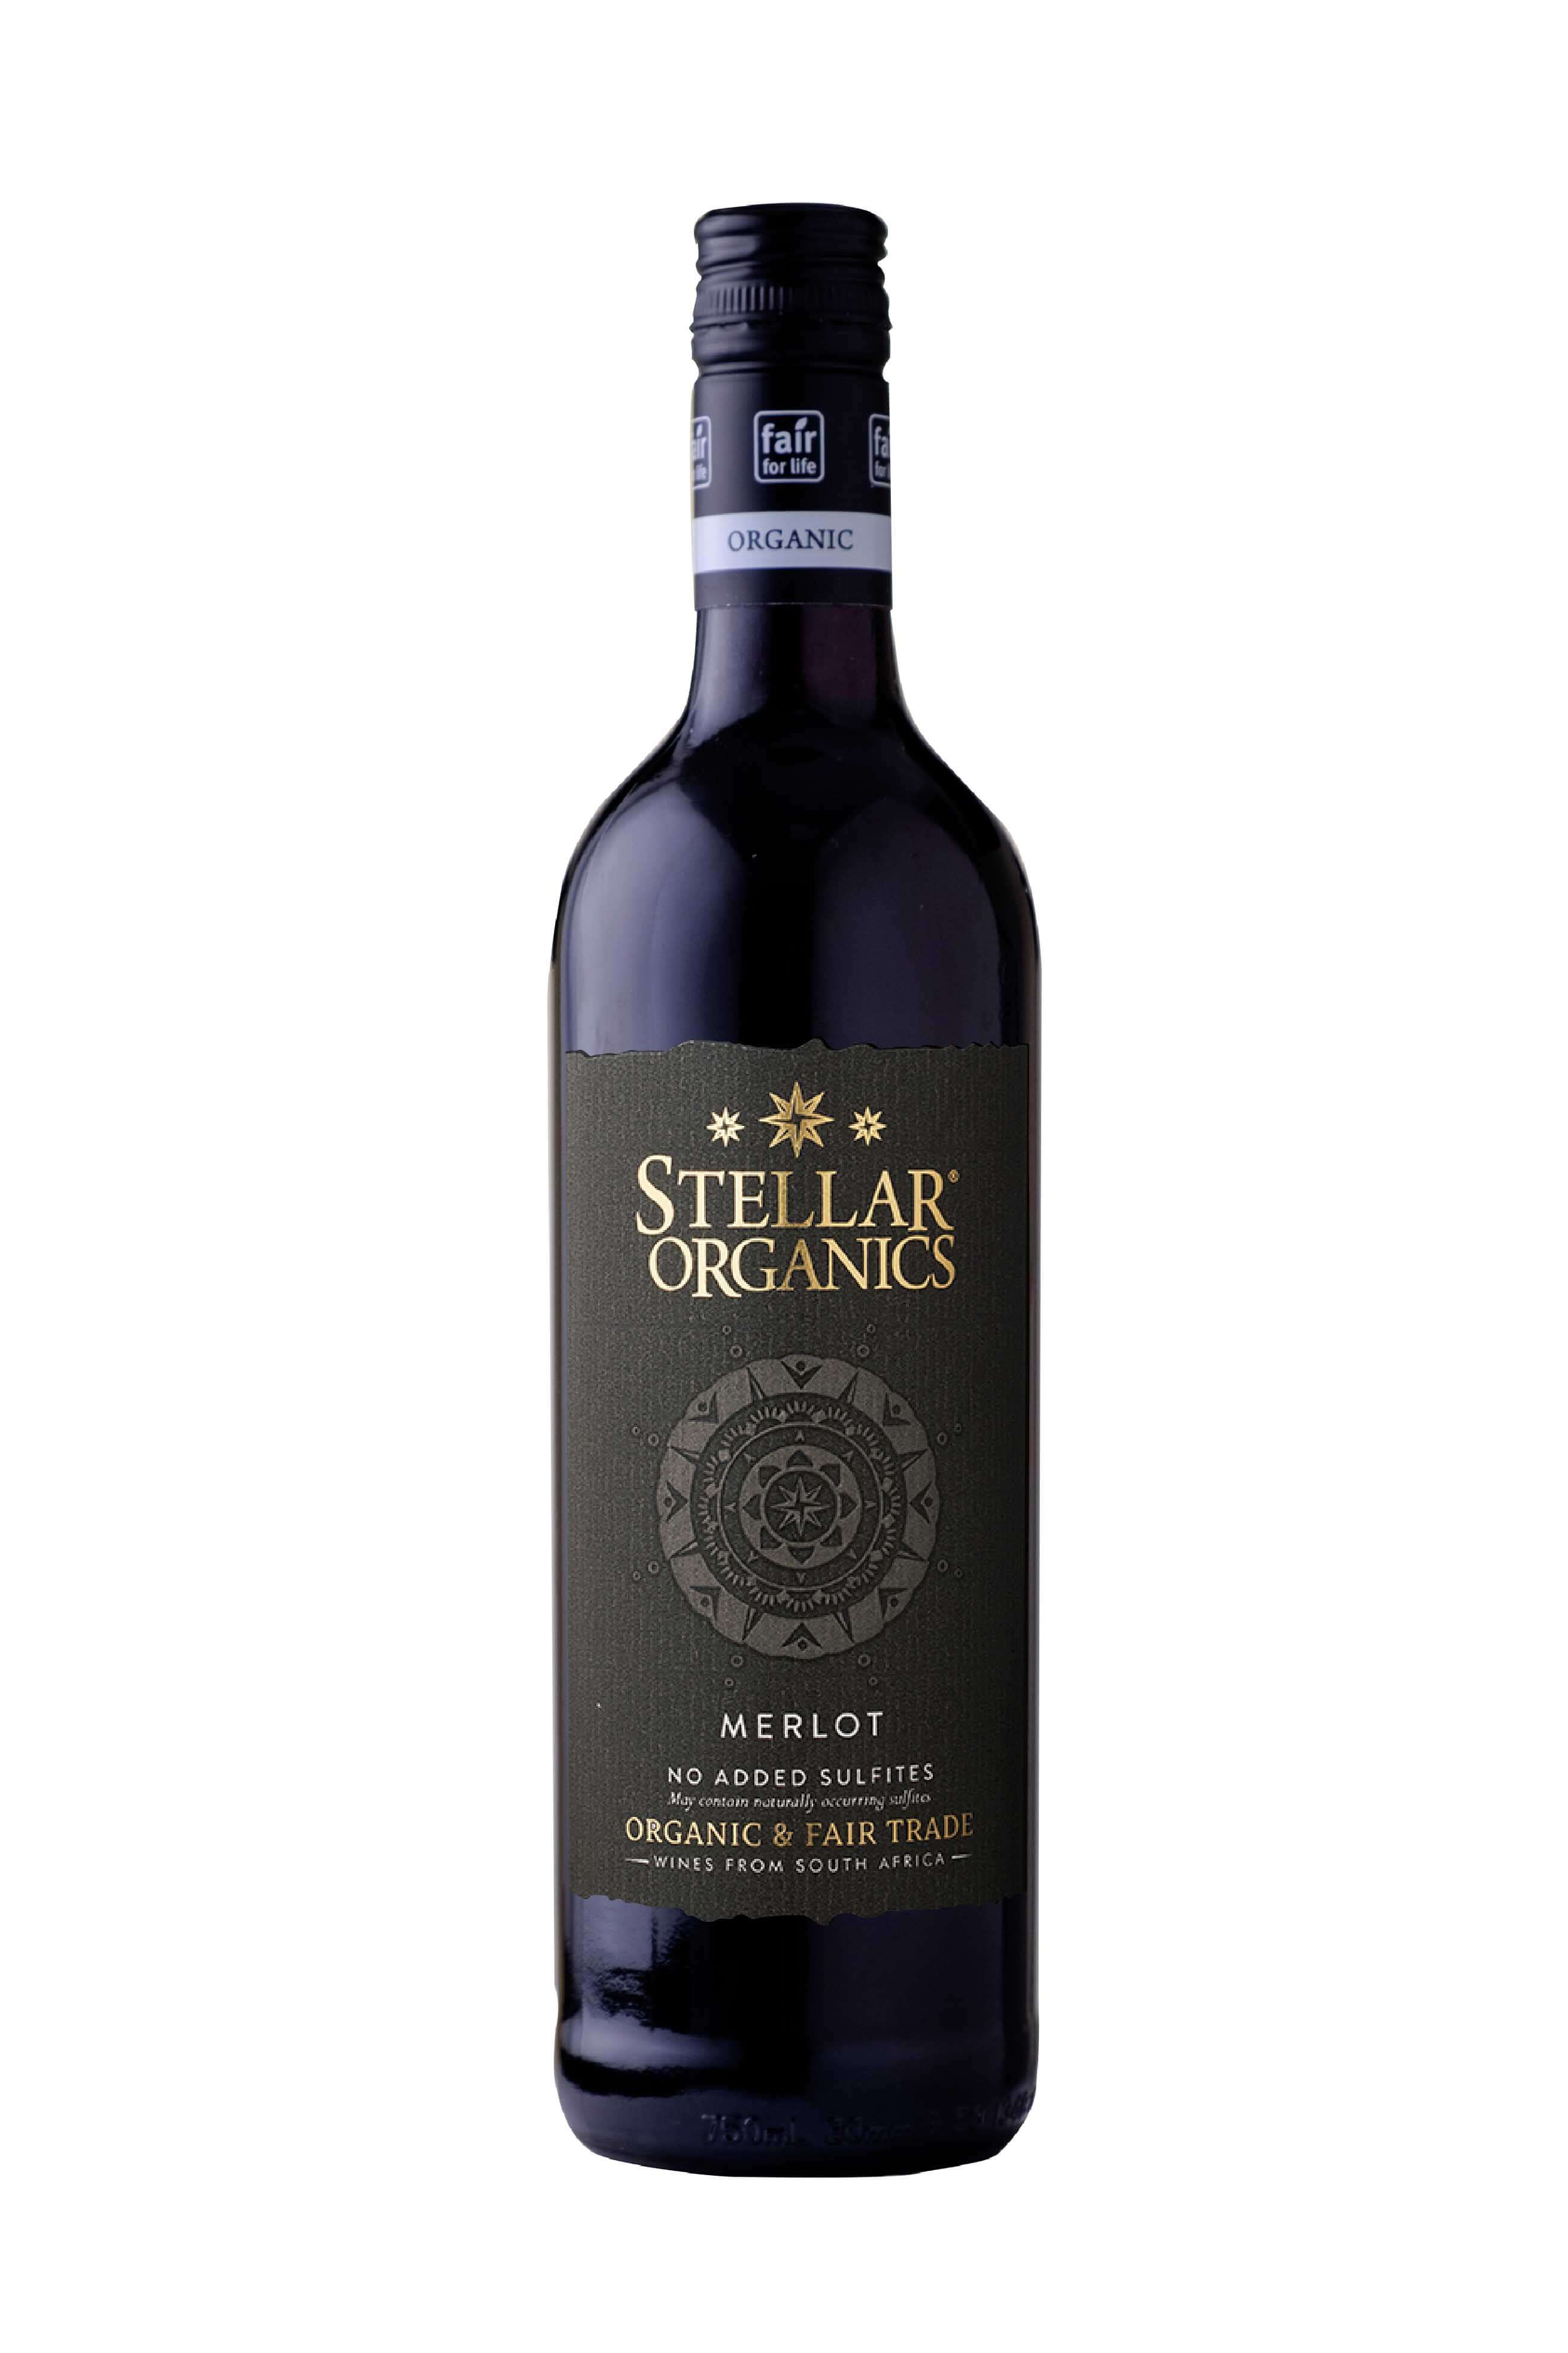 Stellar Organics Merlot Bottleshot